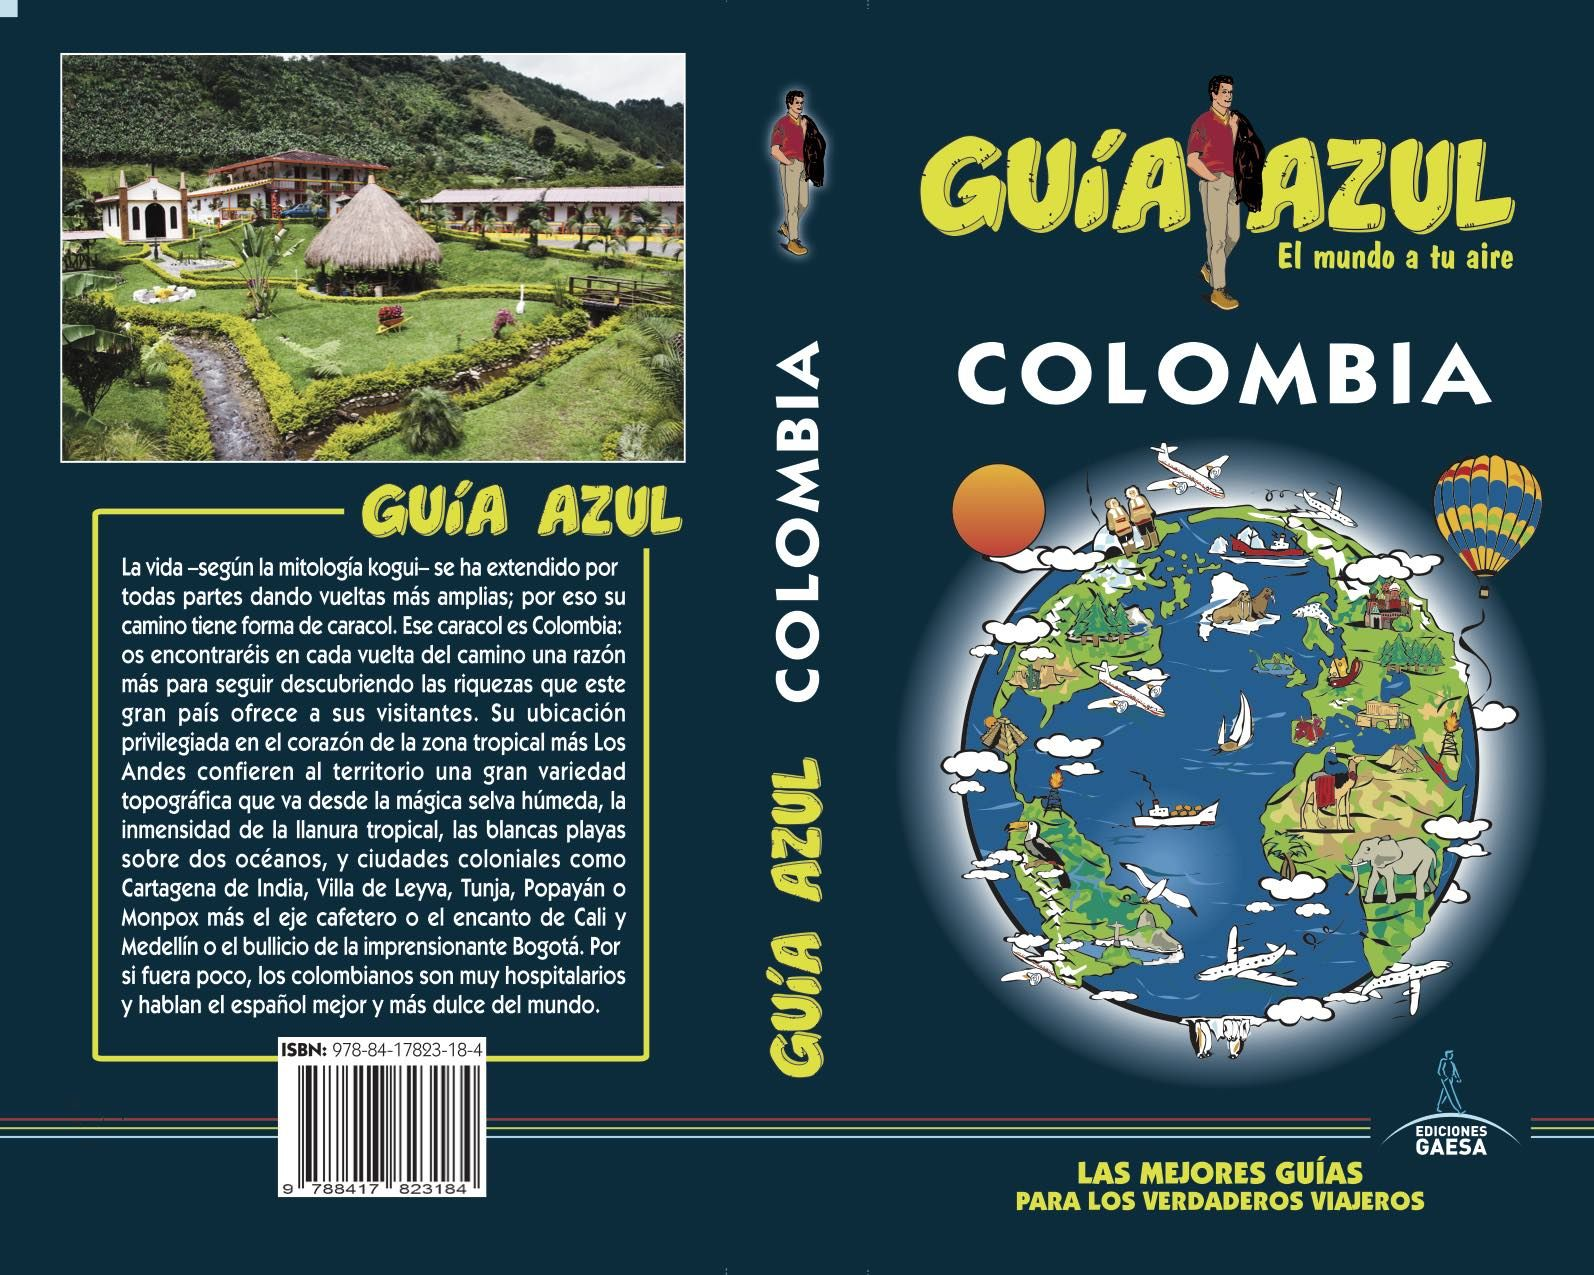 COLOMBIA GUIA AZUL